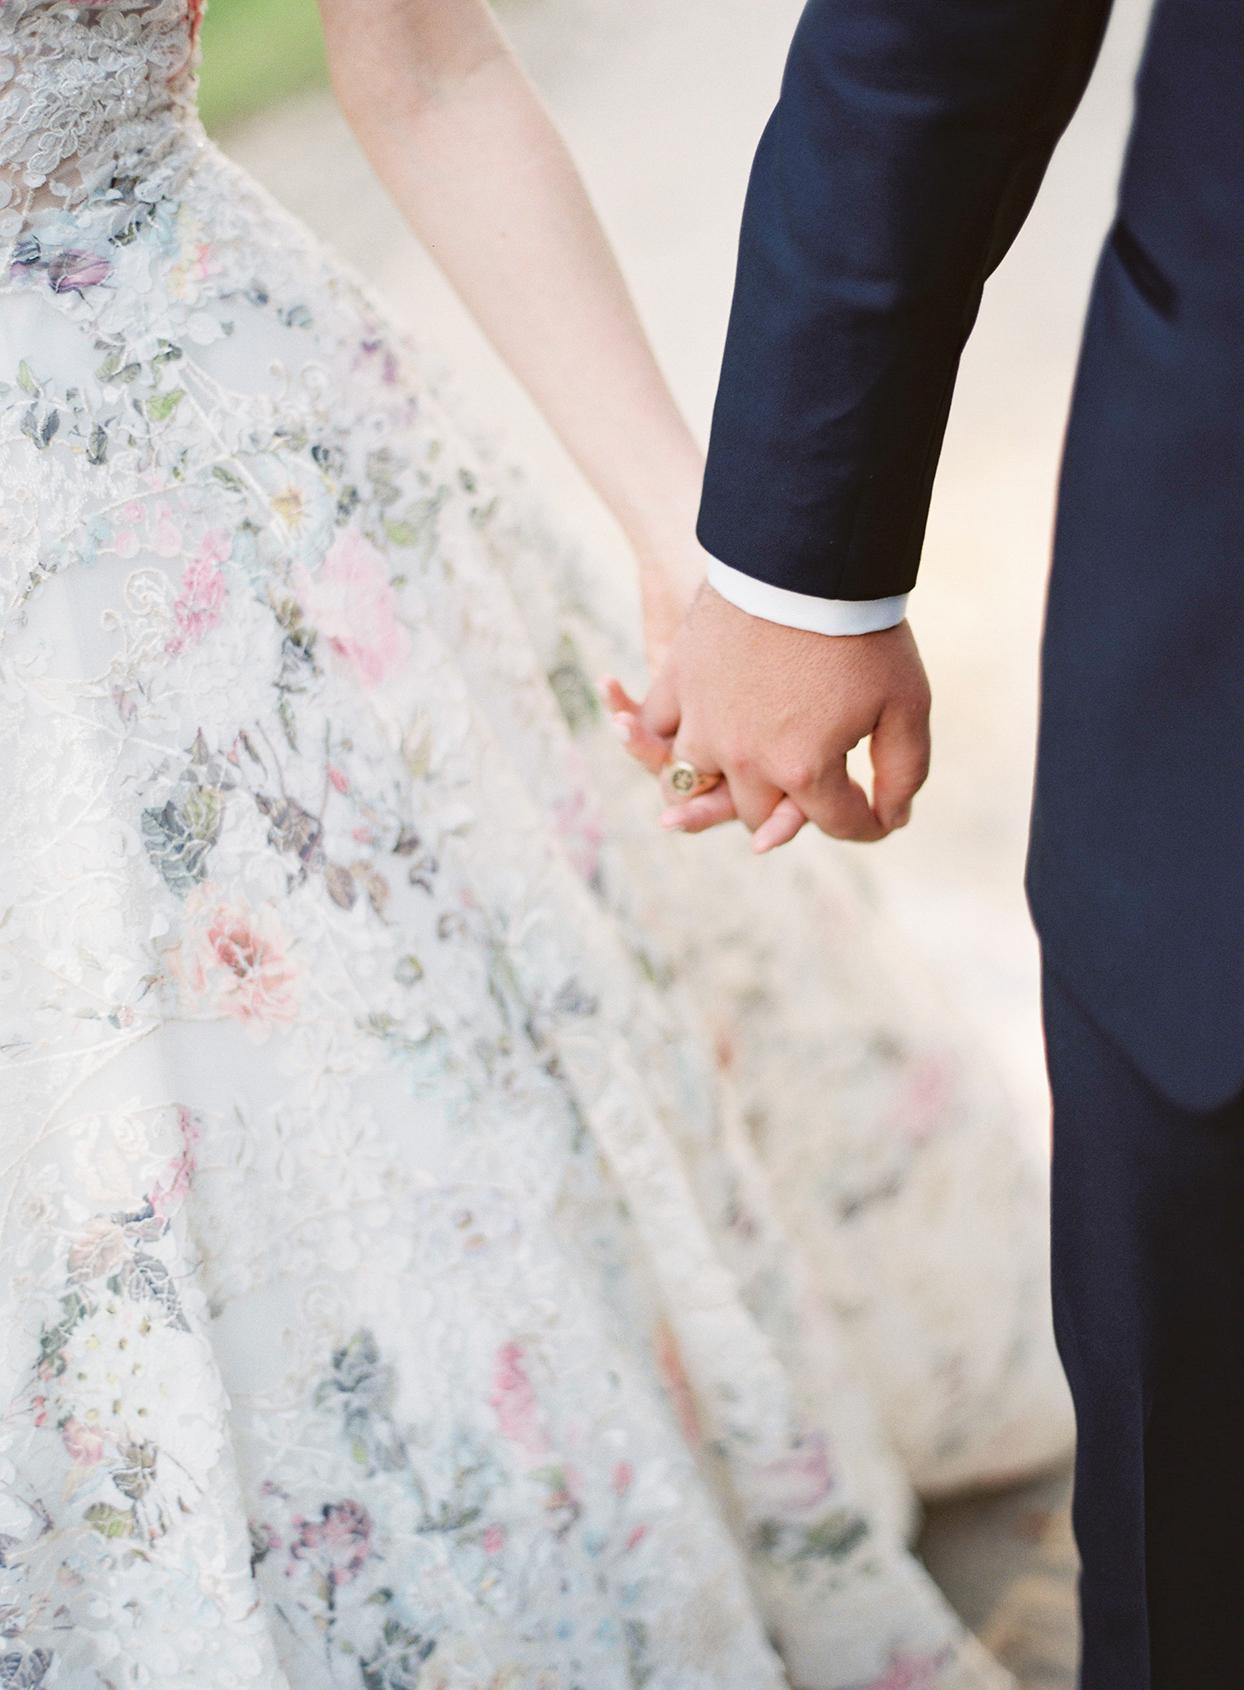 chelsea john wedding couple holding hands